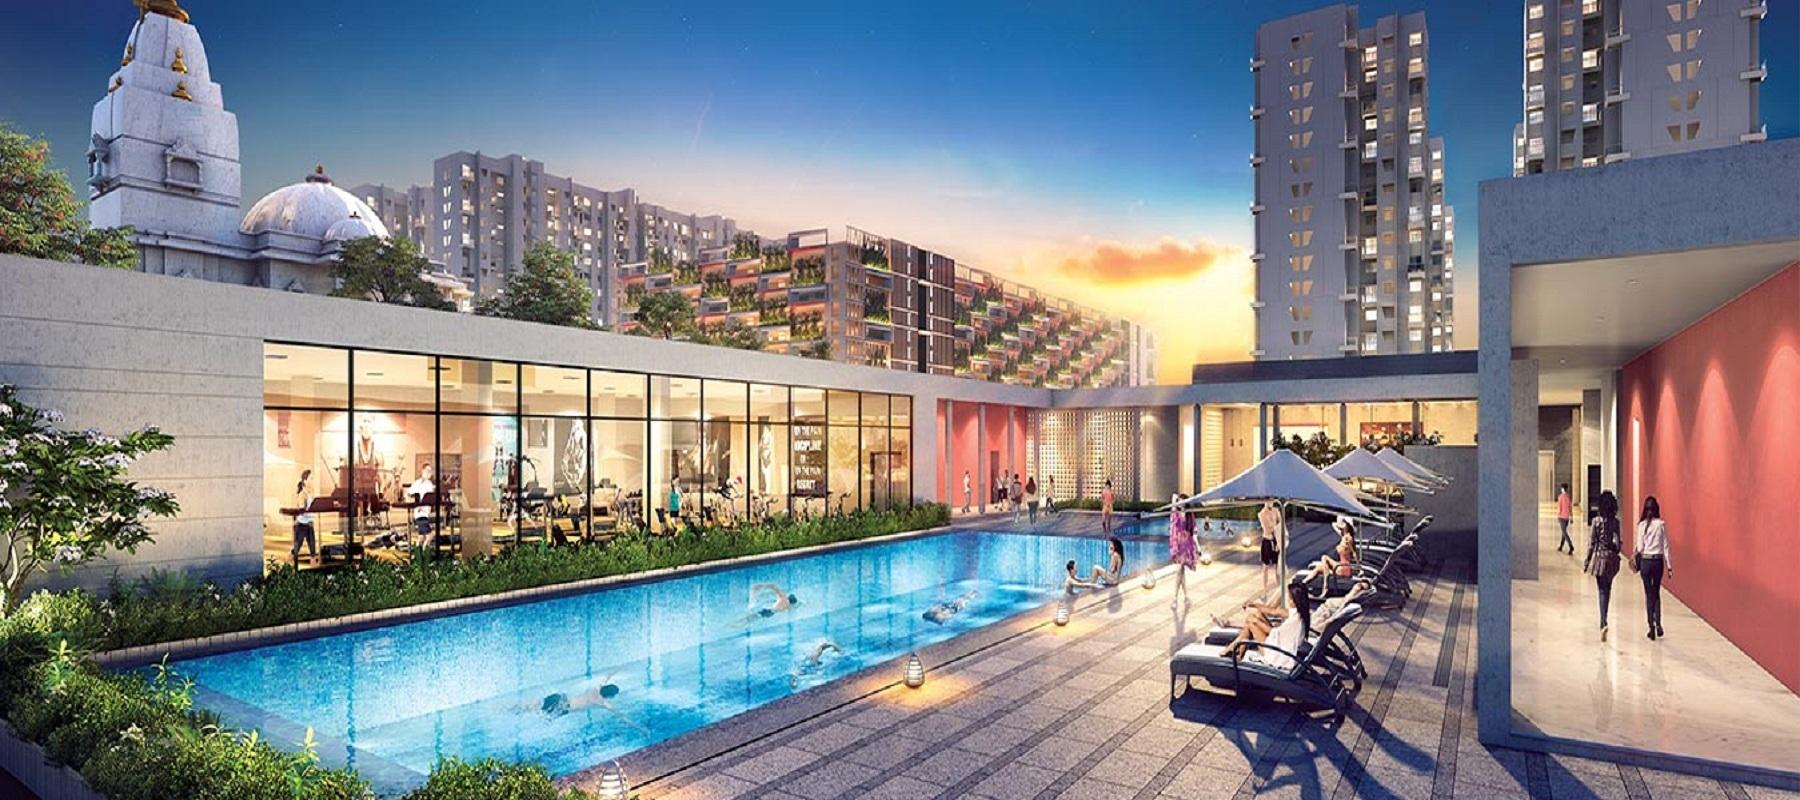 lodha palava casa siena project amenities features2